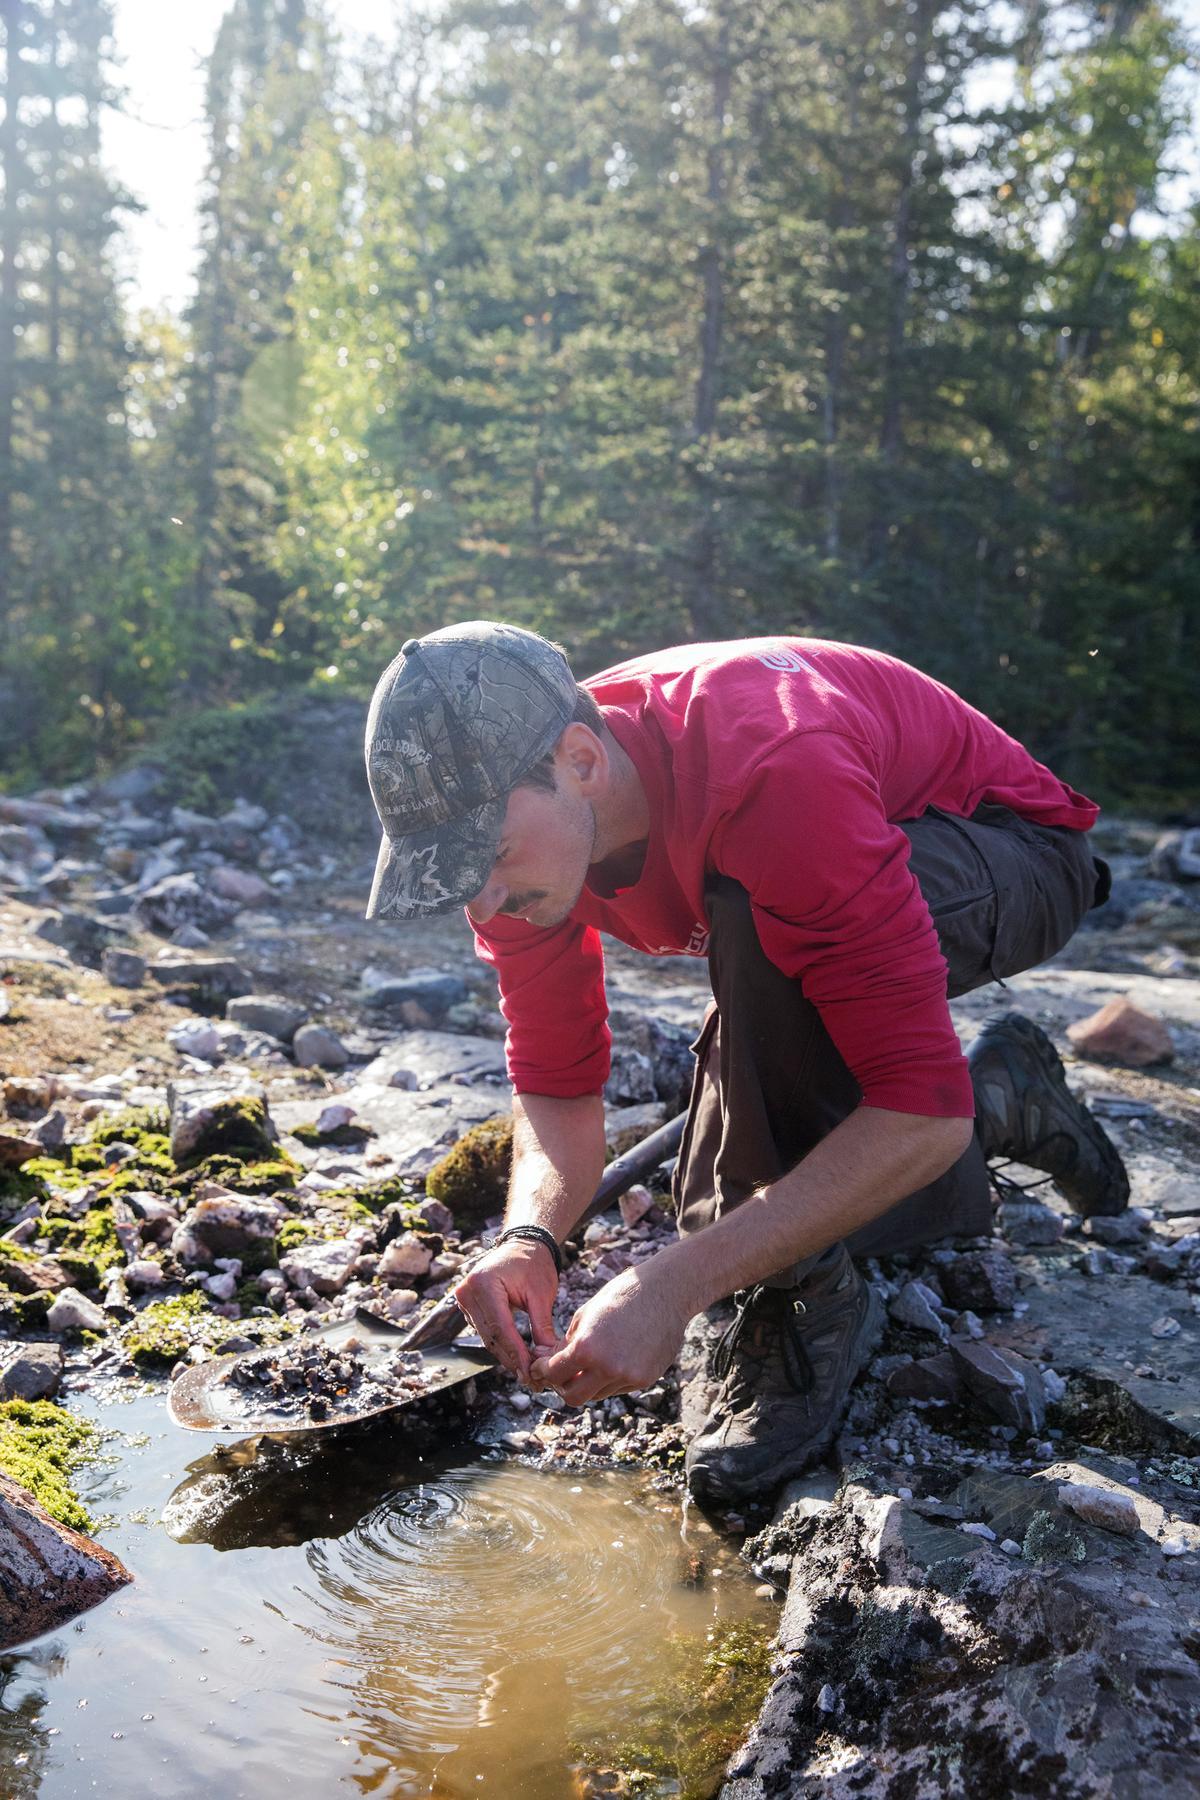 Chris示範在水窪裡分辨寶石。